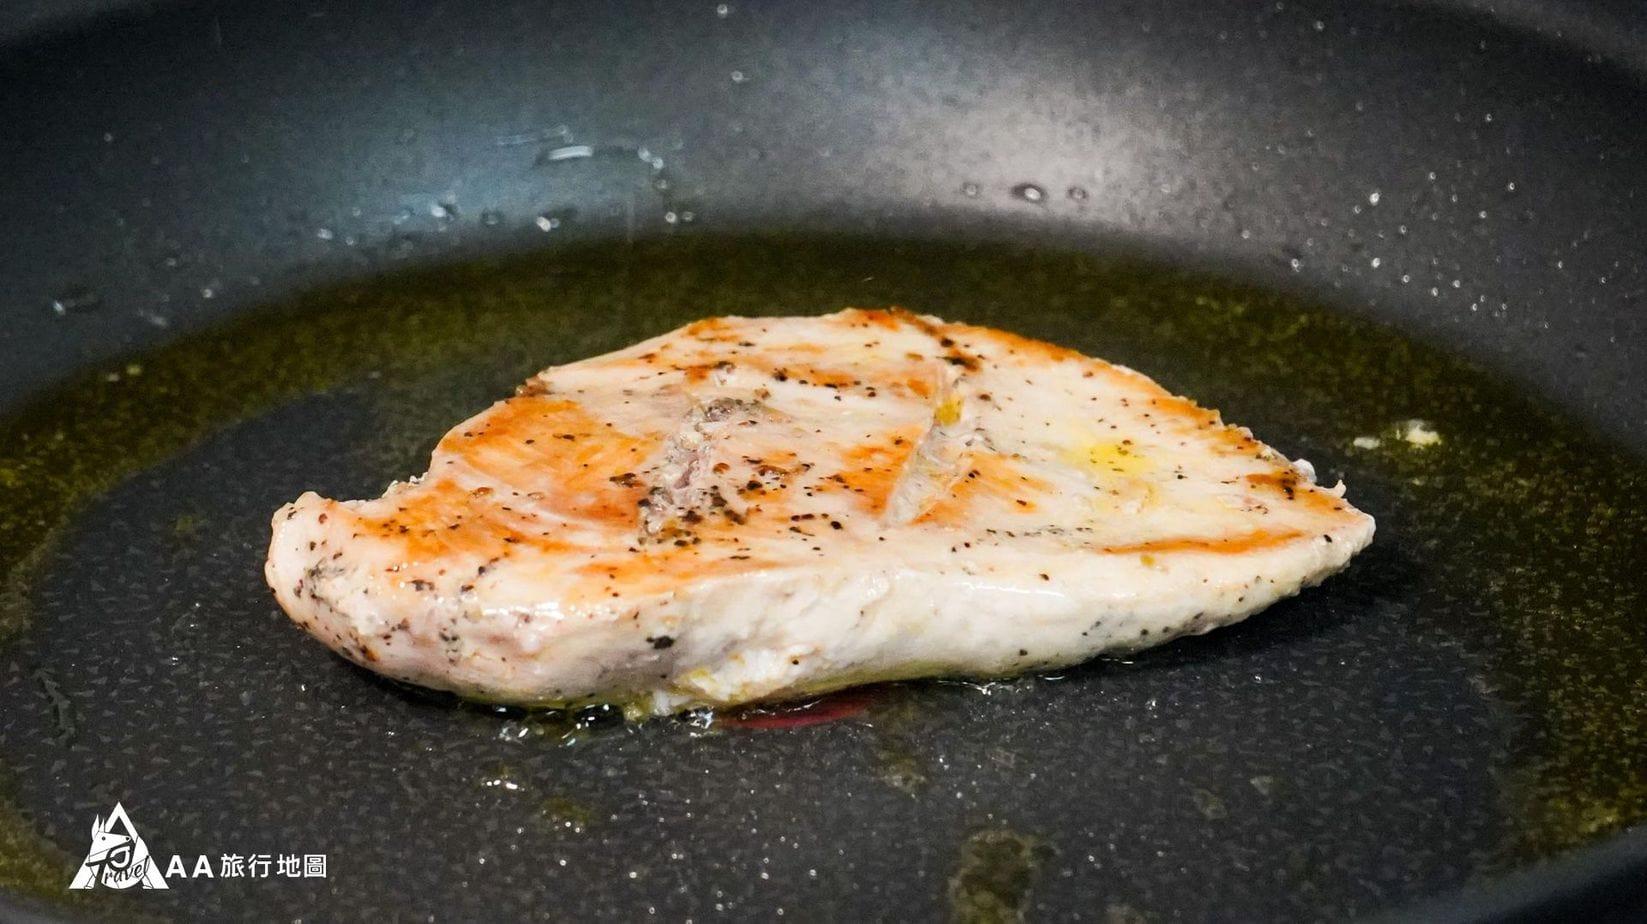 monini 煎出來的肉很漂亮,重點是沒有什麼油煙